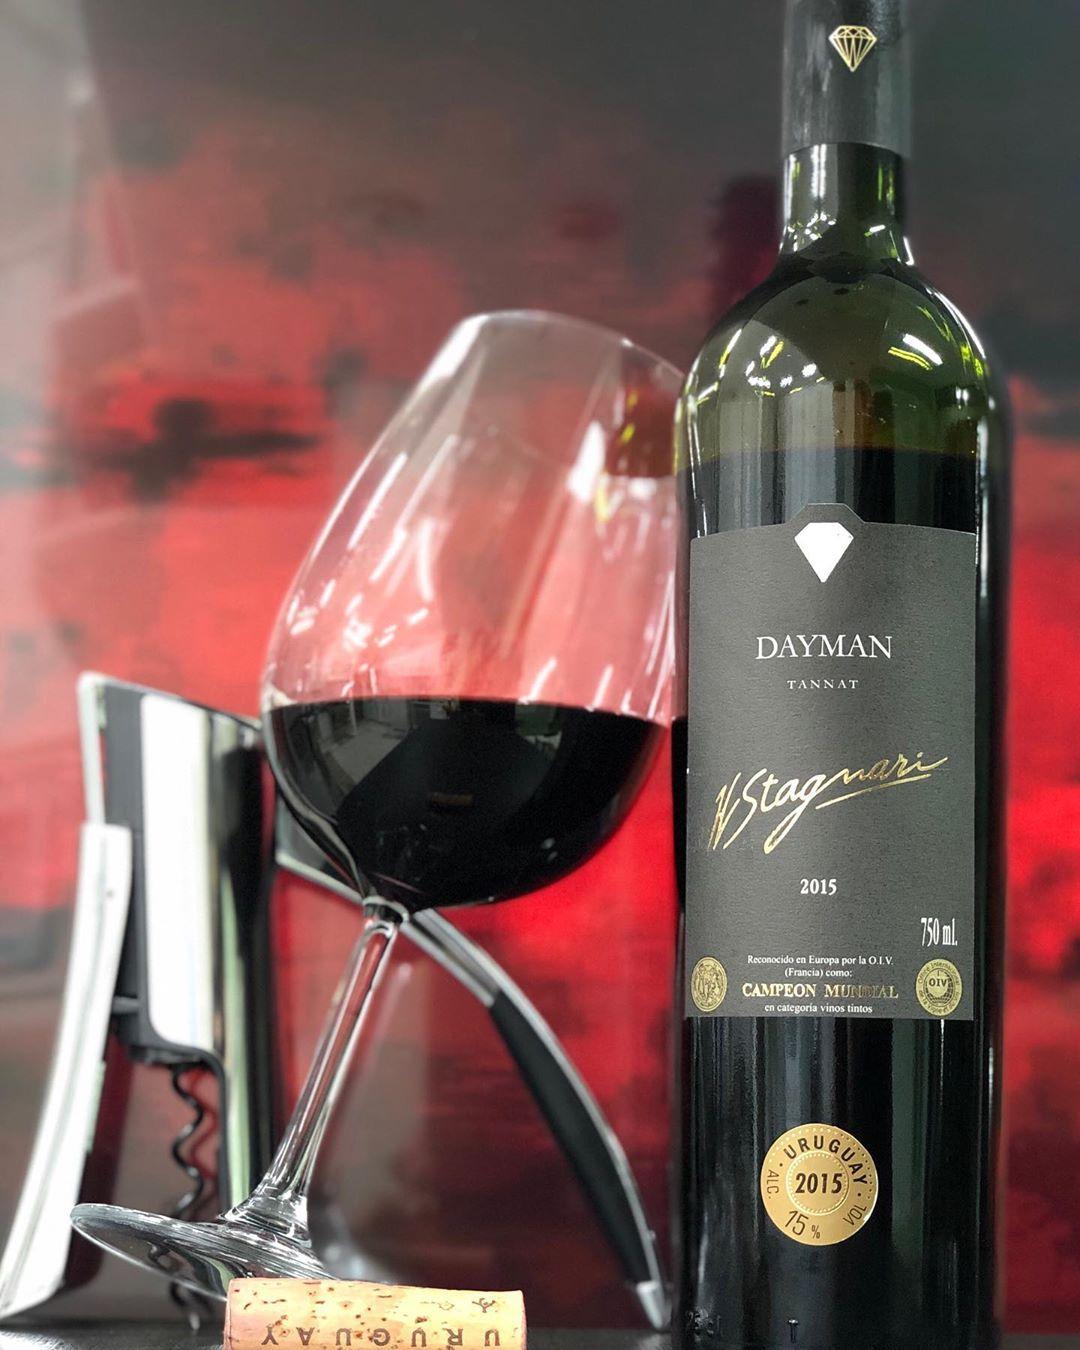 Dayman 100 Tannat 2015 Da Stagnari La Puebla Canelones Uruguai Degustado Em Agosto 2019 Delicioso Tannat Cor Ru Red Wine Alcohol Alcoholic Drinks